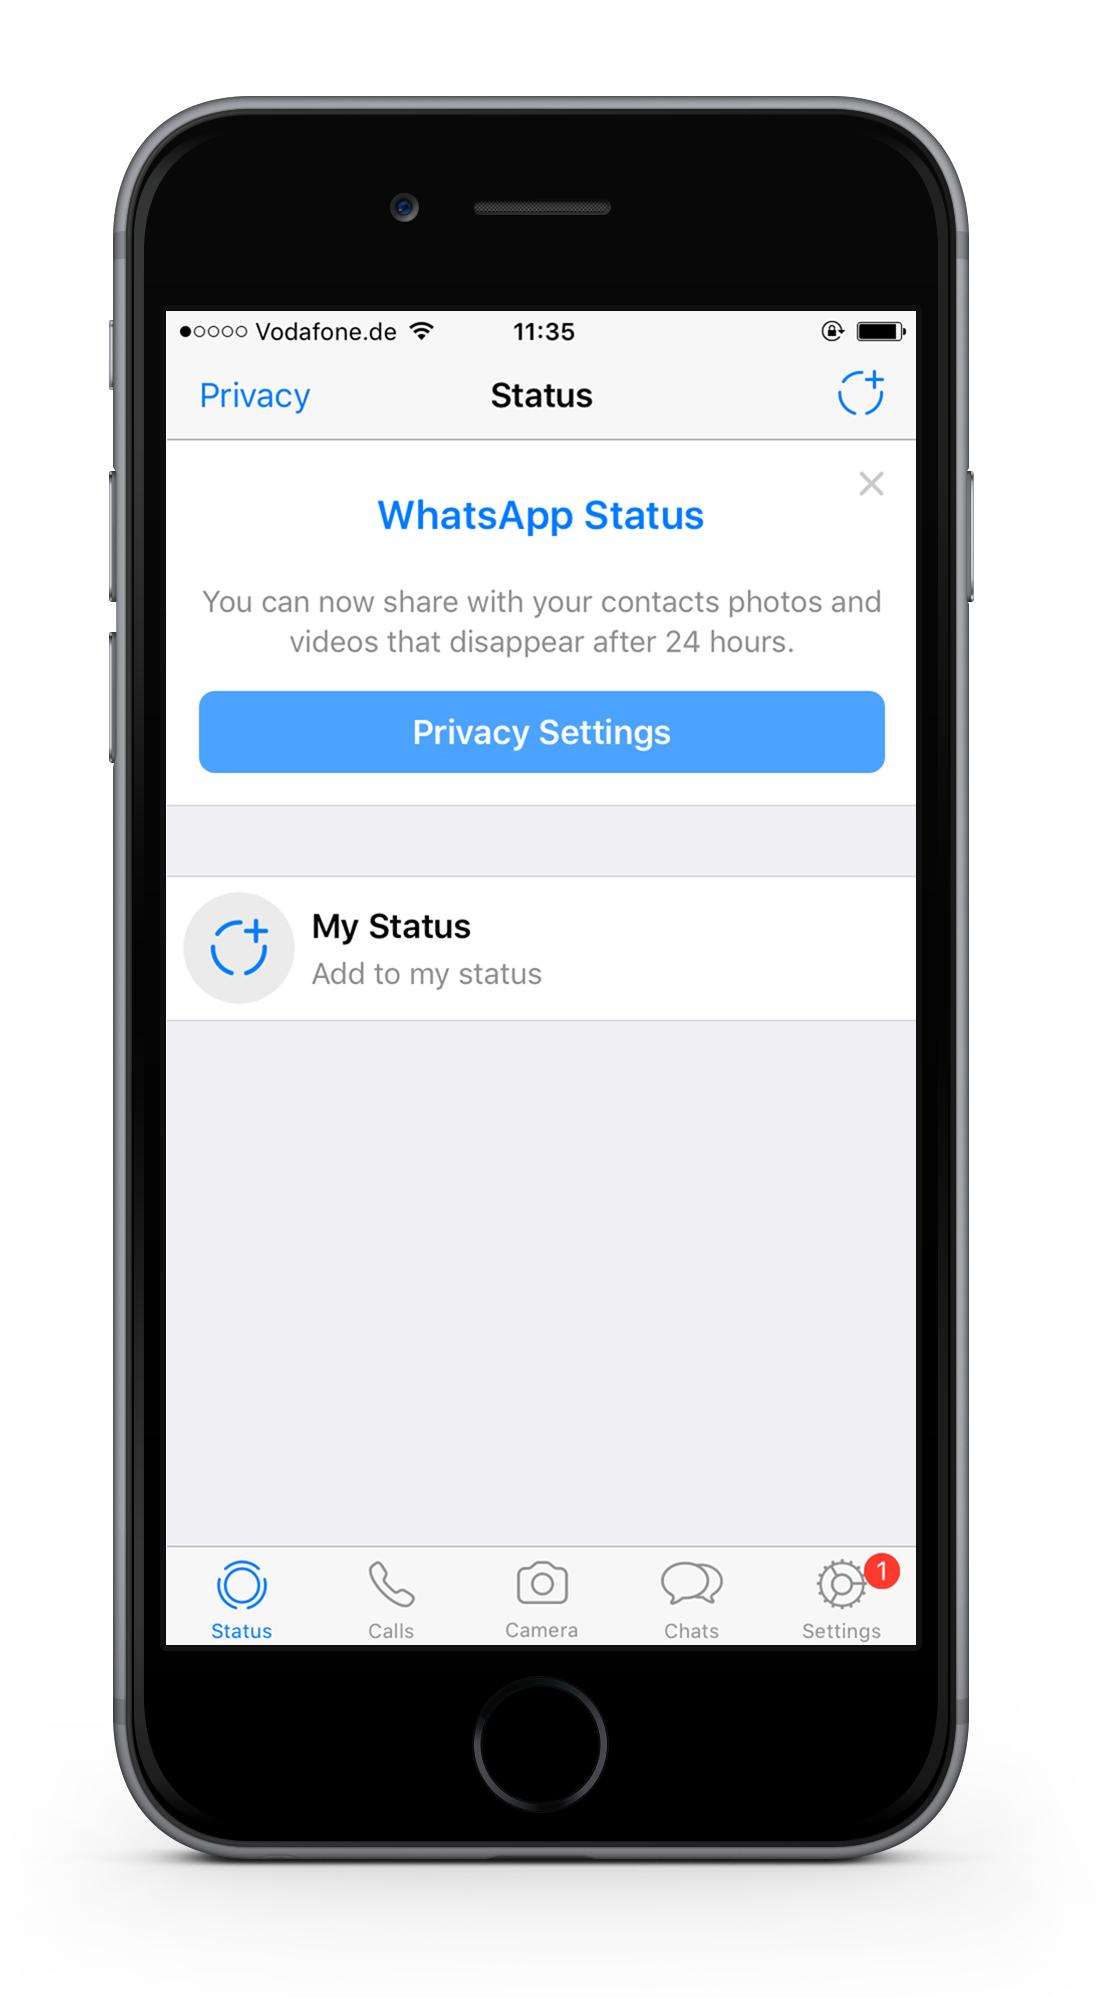 whats-app-status-screen